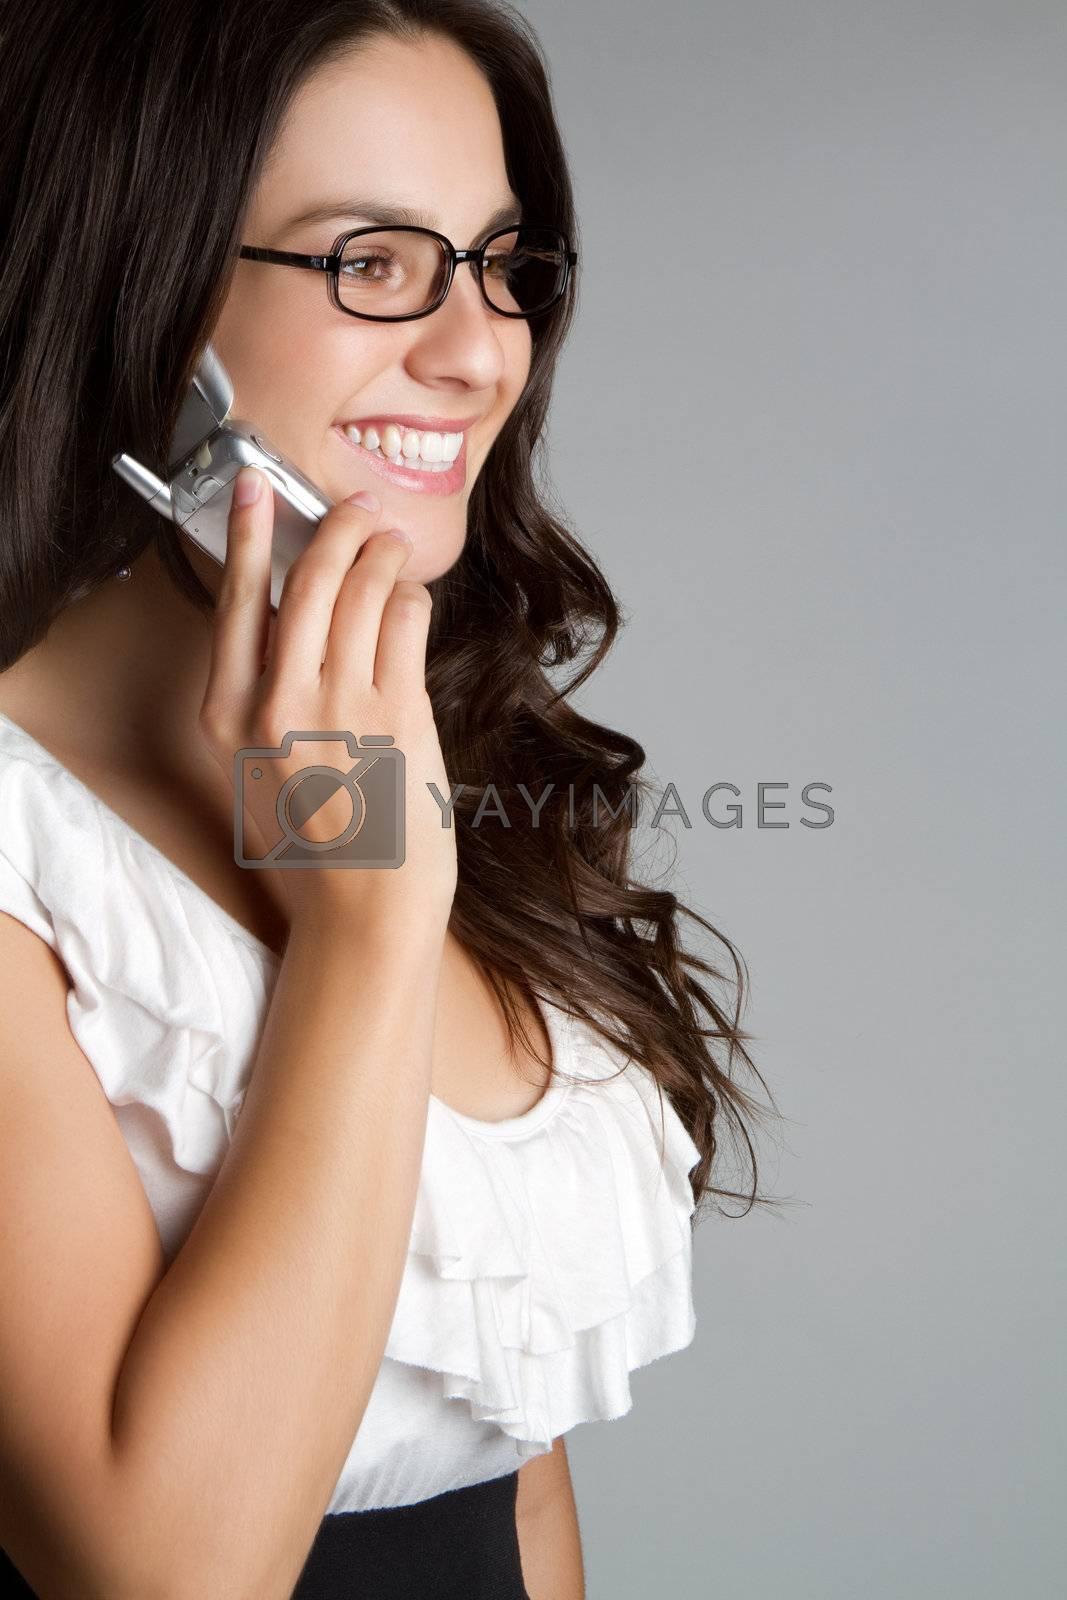 Beautiful young smiling phone woman